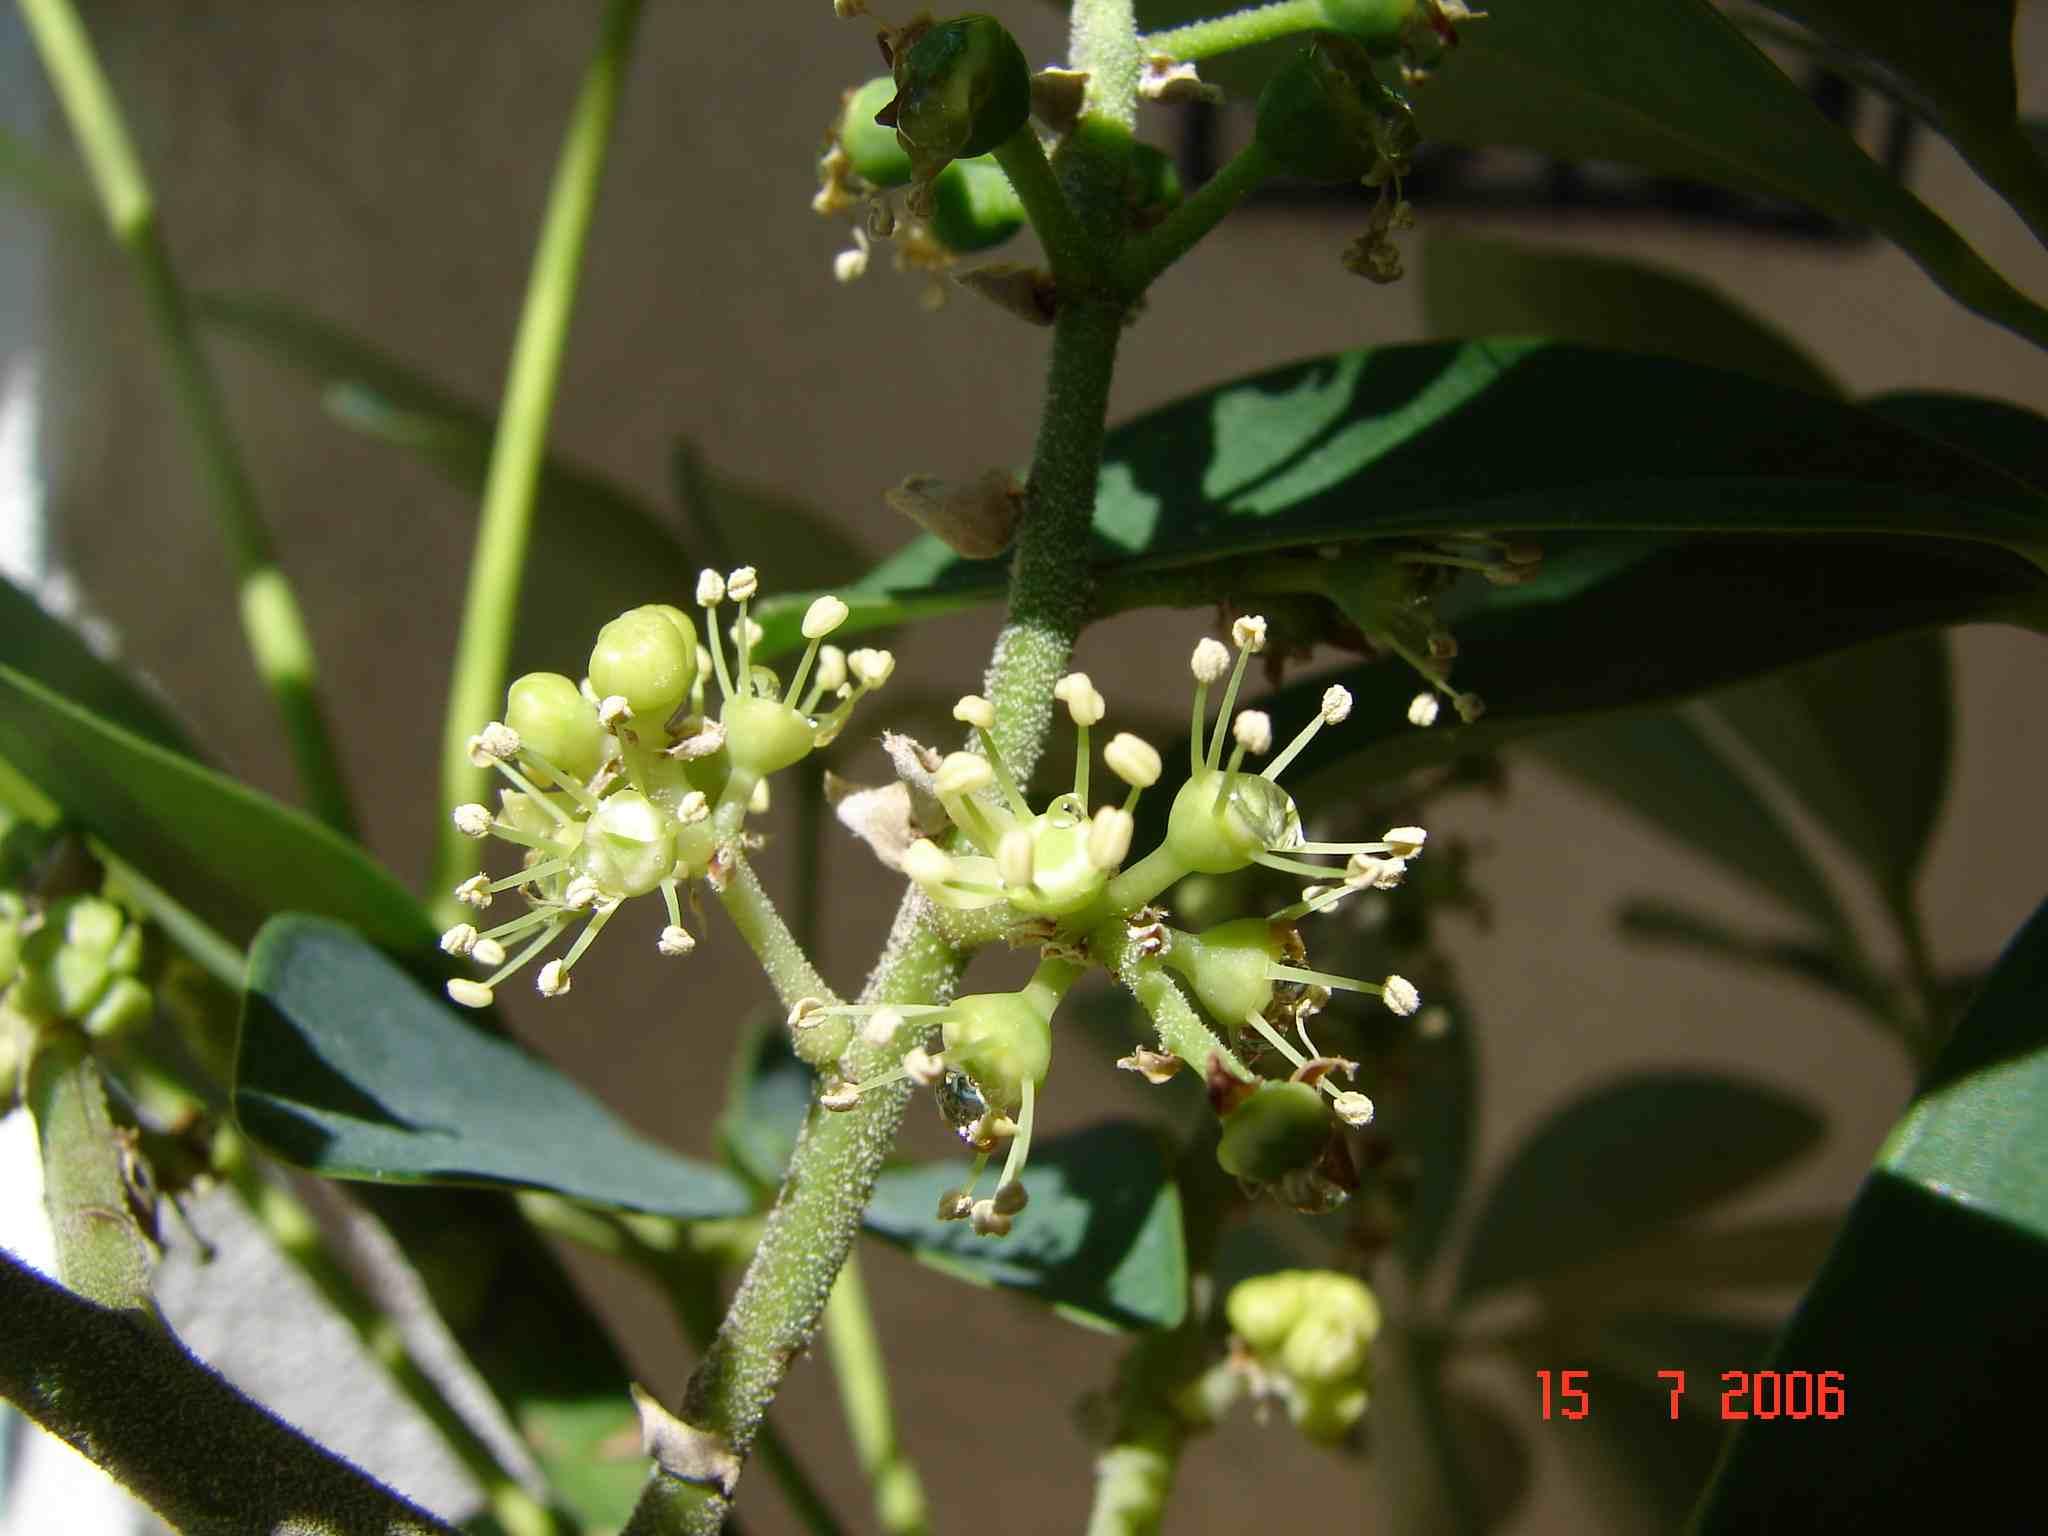 Strahlenaralie - Epiphyten zimmerpflanze ...